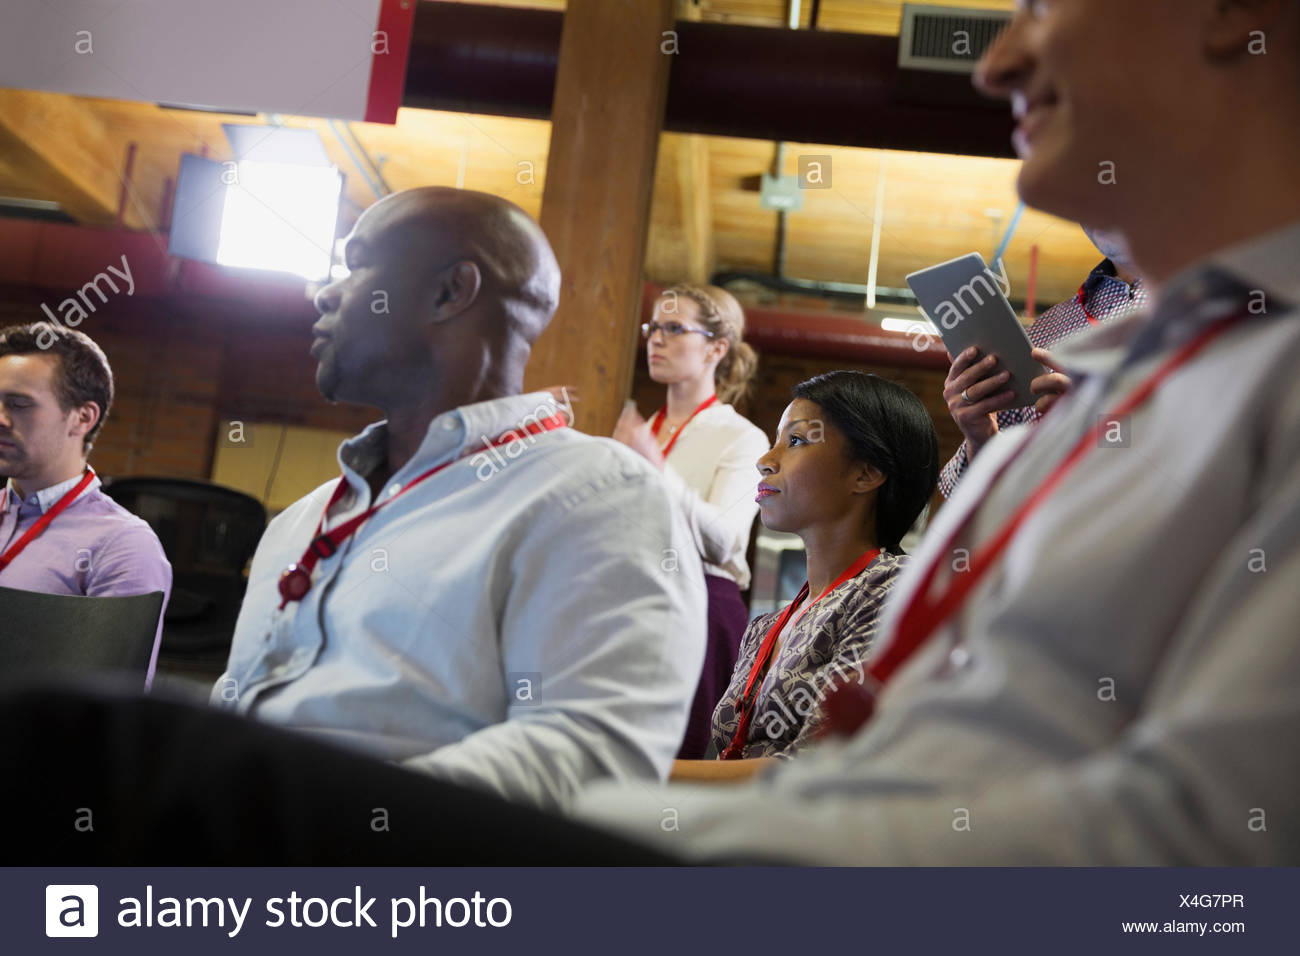 Geschäftsleute in Zielgruppe Konferenz Stockbild